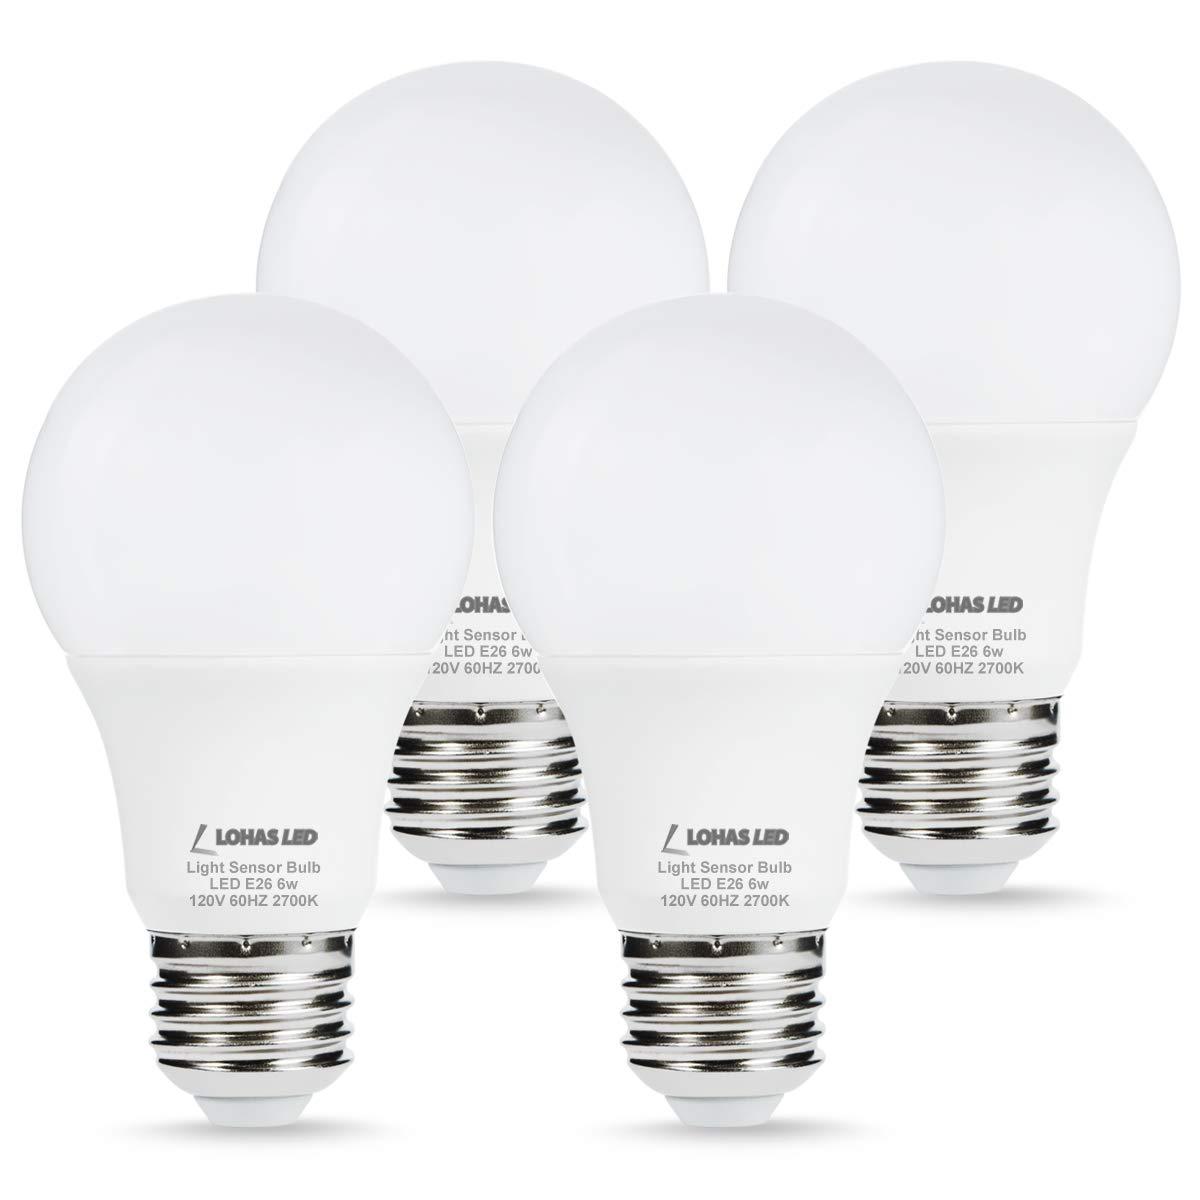 LOHAS LED Sensor Light Bulb Dusk to Dawn Front Porch Lights, A19 LED Smart Sensor Bulbs, 40 Watt Equivalent, E26 Base, Warm White(2700K) Automatic Security Light for indoor/Outdoor Lighting, Pack of 4